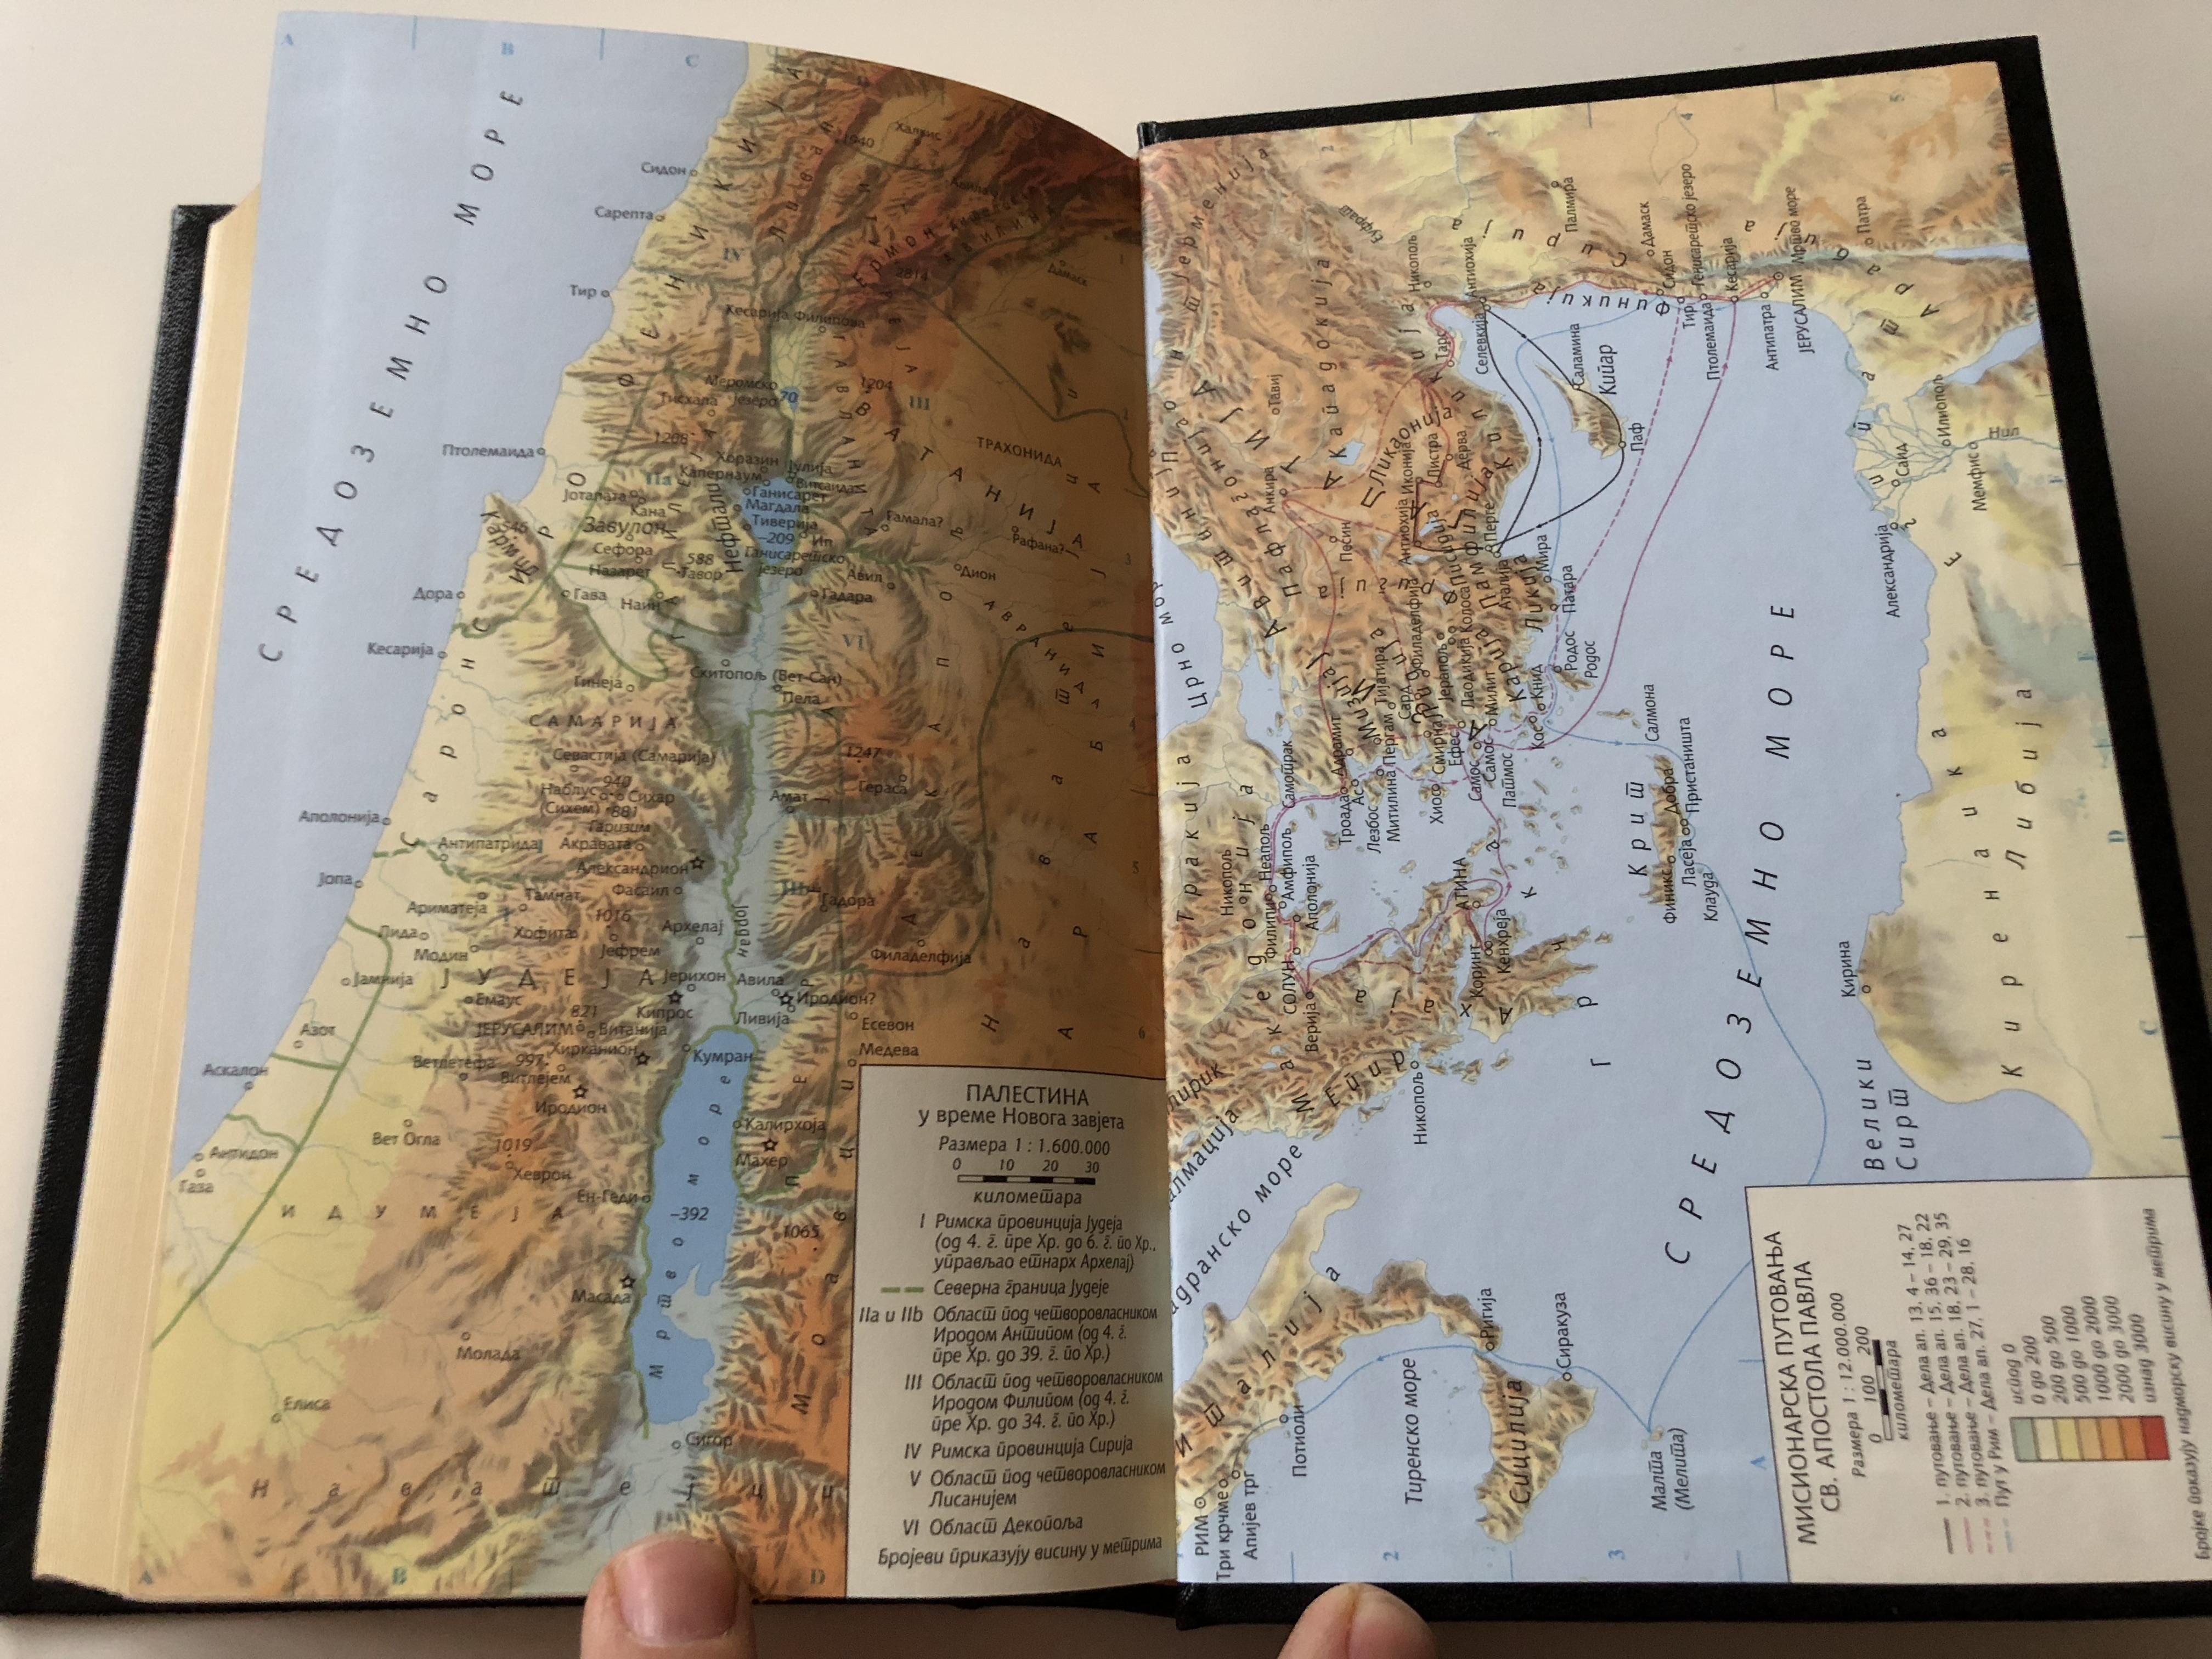 serbian-language-bible-burgundy-cover-with-golden-cross-cyrillic-script-043hs-36-.jpg